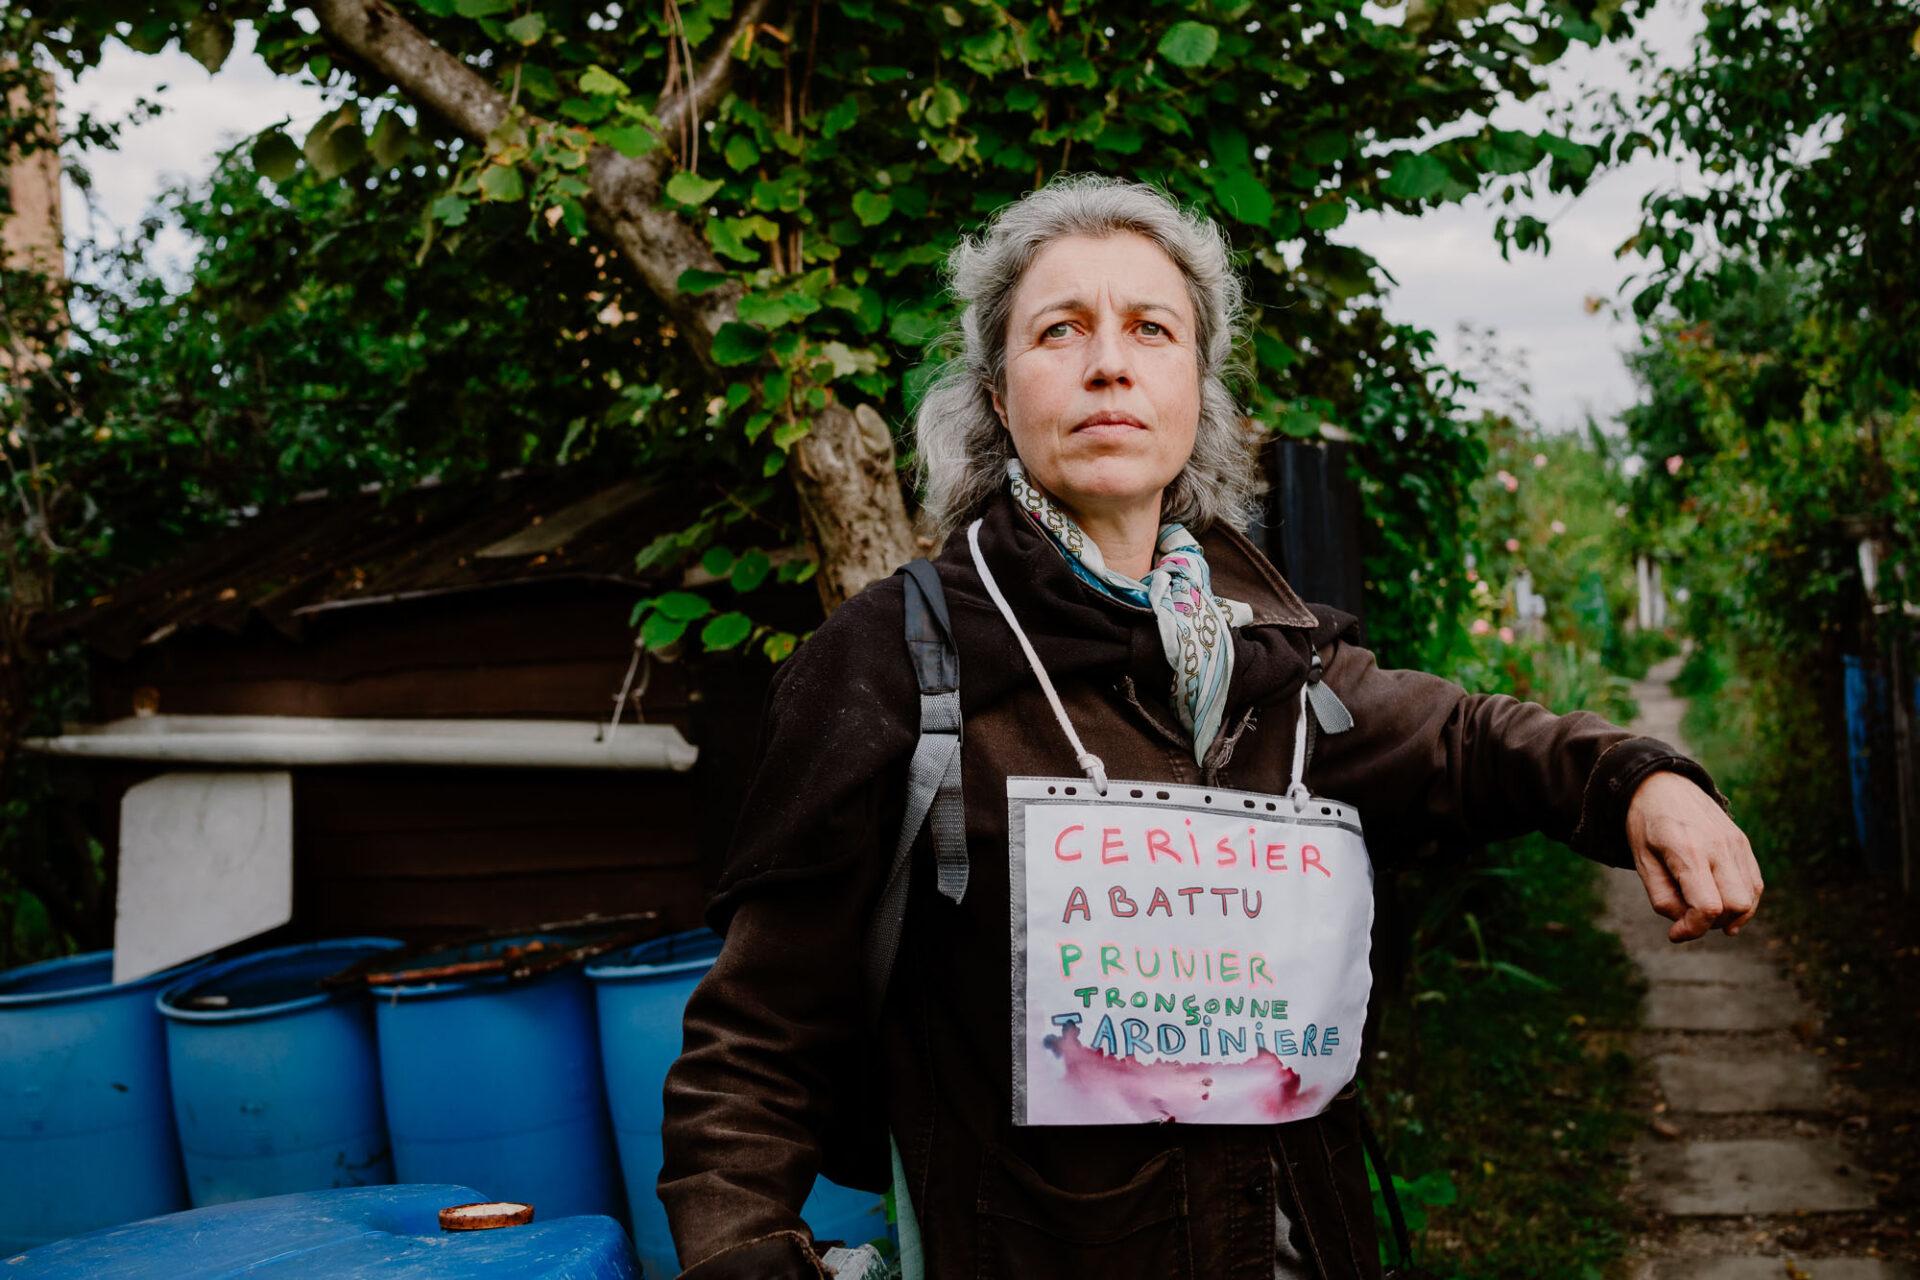 Jardins ouvriers aubervilliers 51 - Dagmara Bojenko - Eco-conscious Weddings, Births & Families